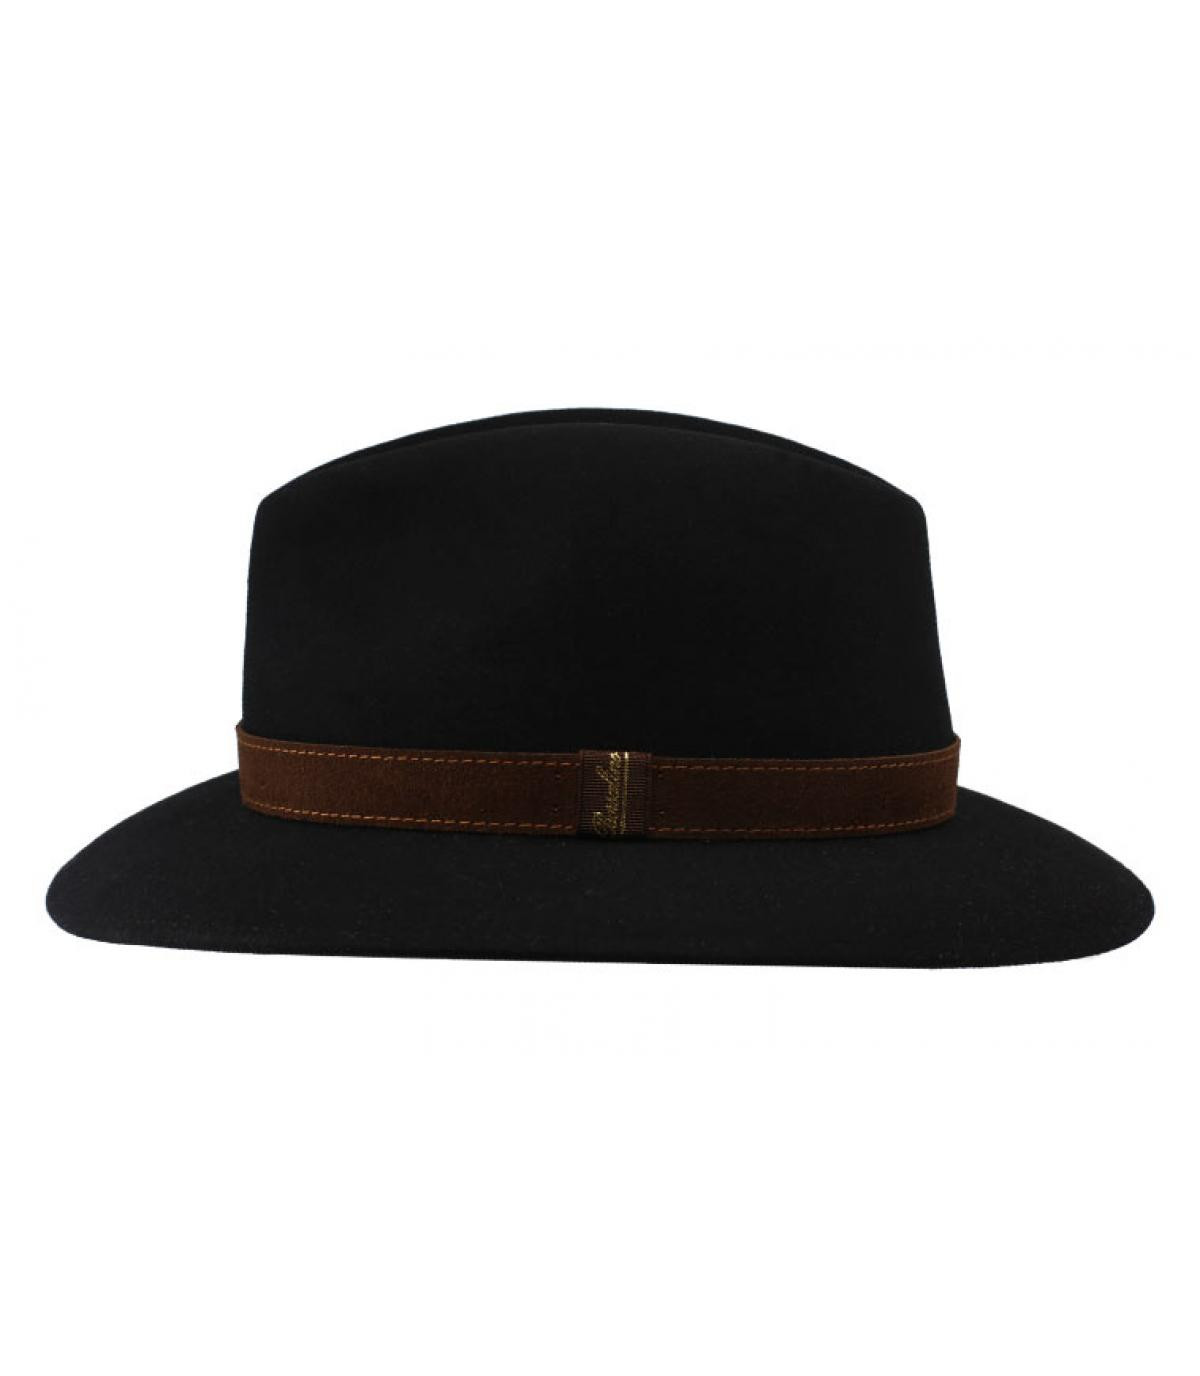 fedora feltro nero Borsalino - Alessandria black Fur Flet Hat da ... cb0bd4e0dae6